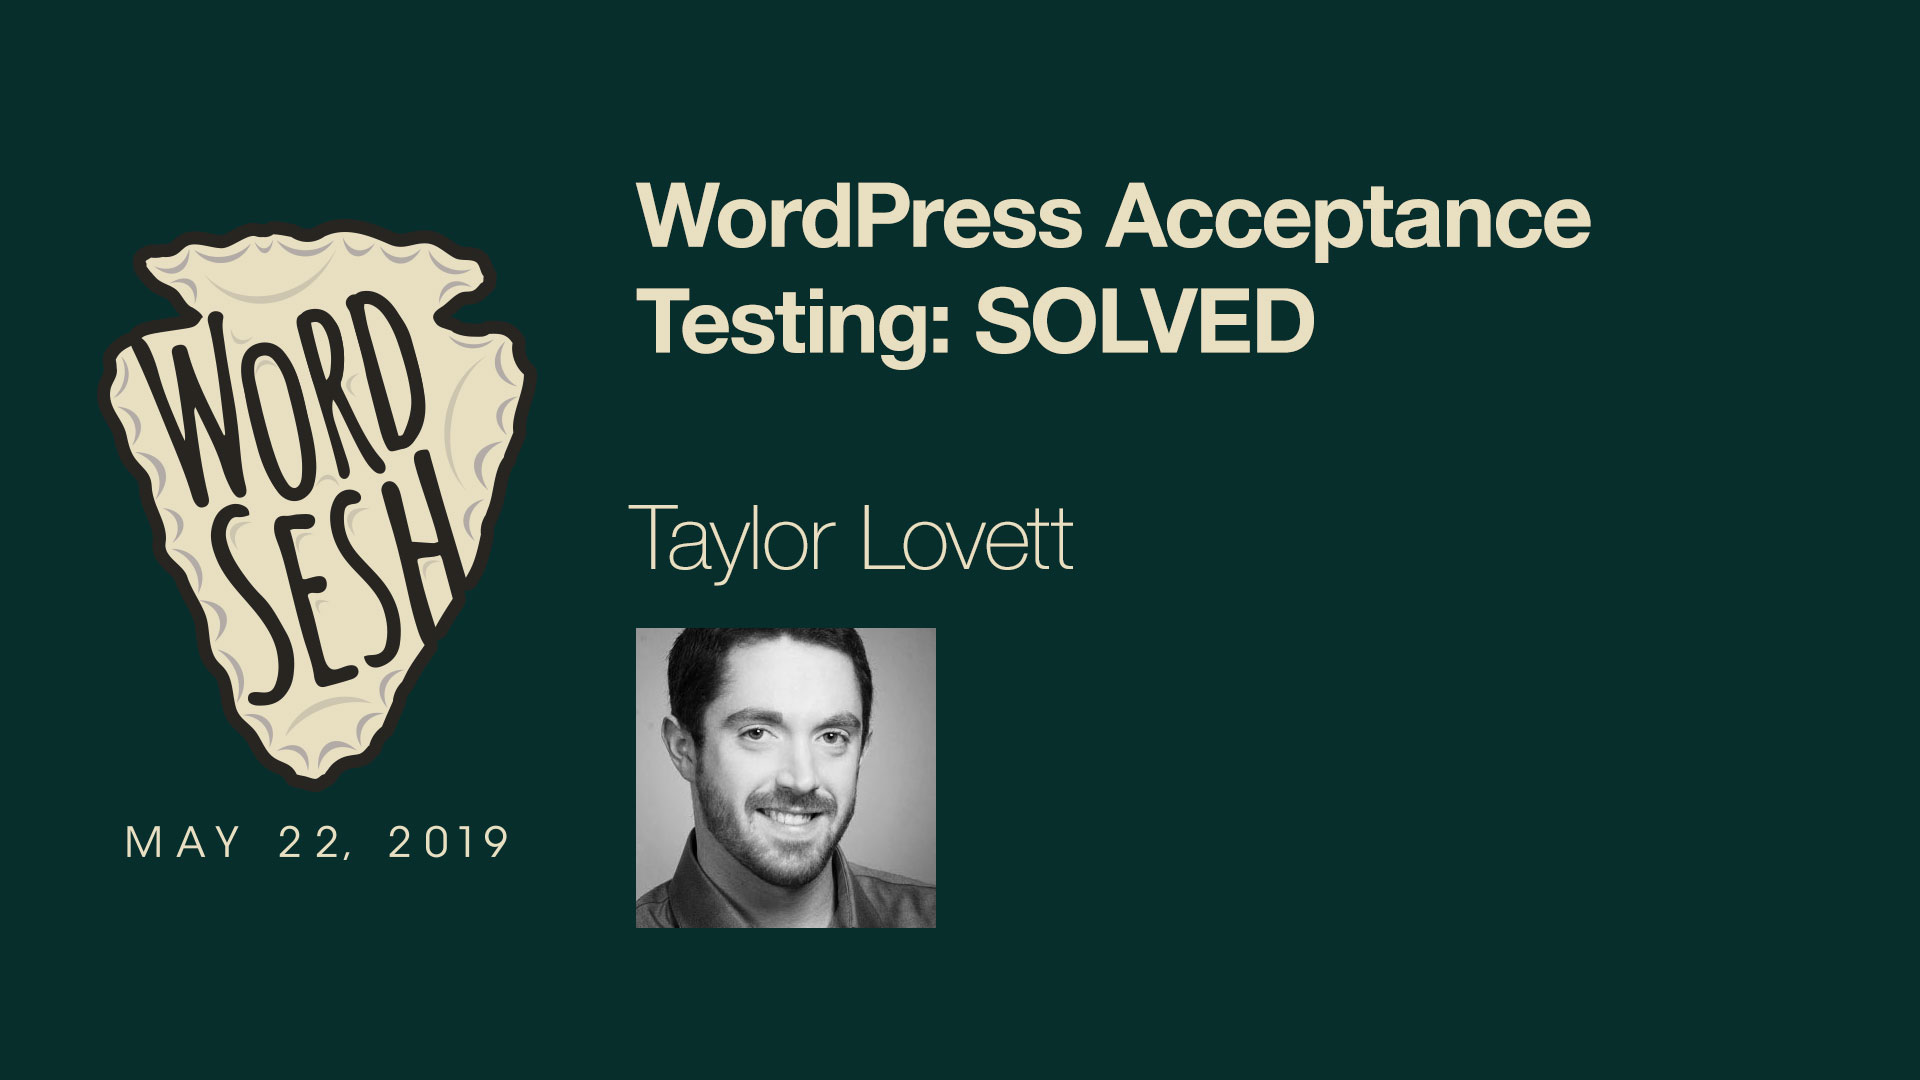 04-WordSesh-WordPress-Acceptance-Testing-Solved-Taylor-Lovett